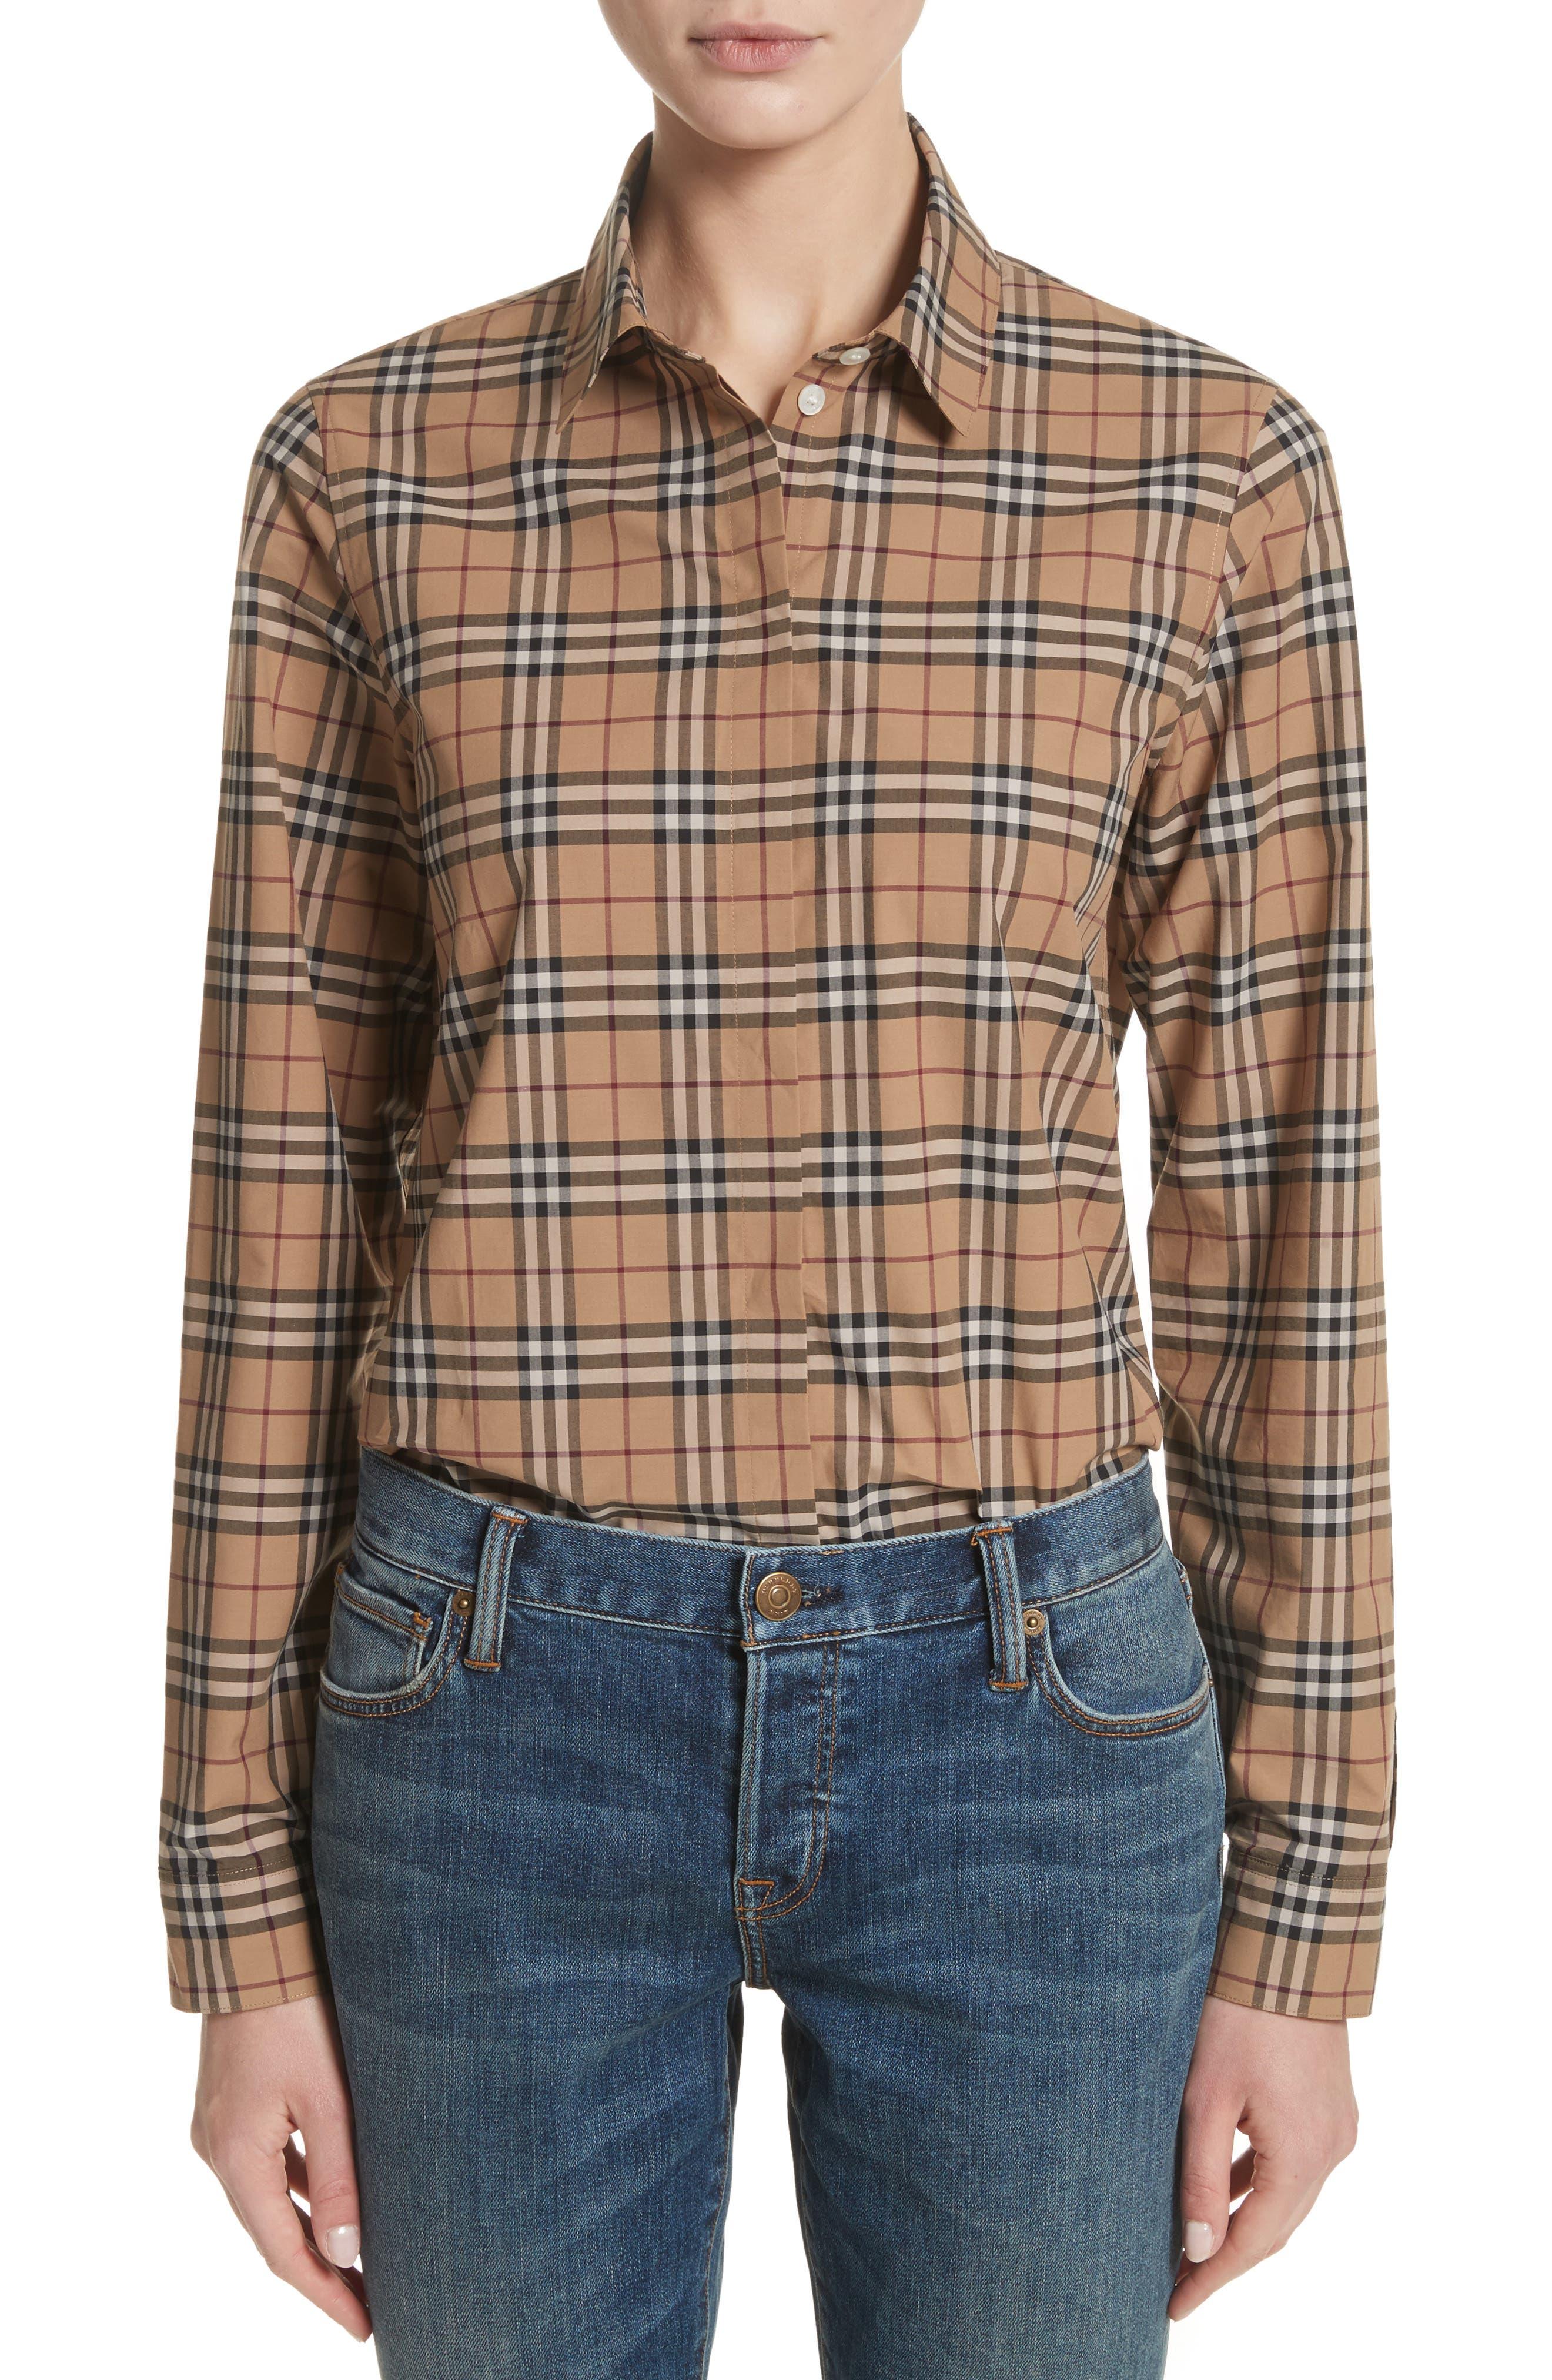 Vintage Check Cotton Shirt,                             Main thumbnail 1, color,                             231